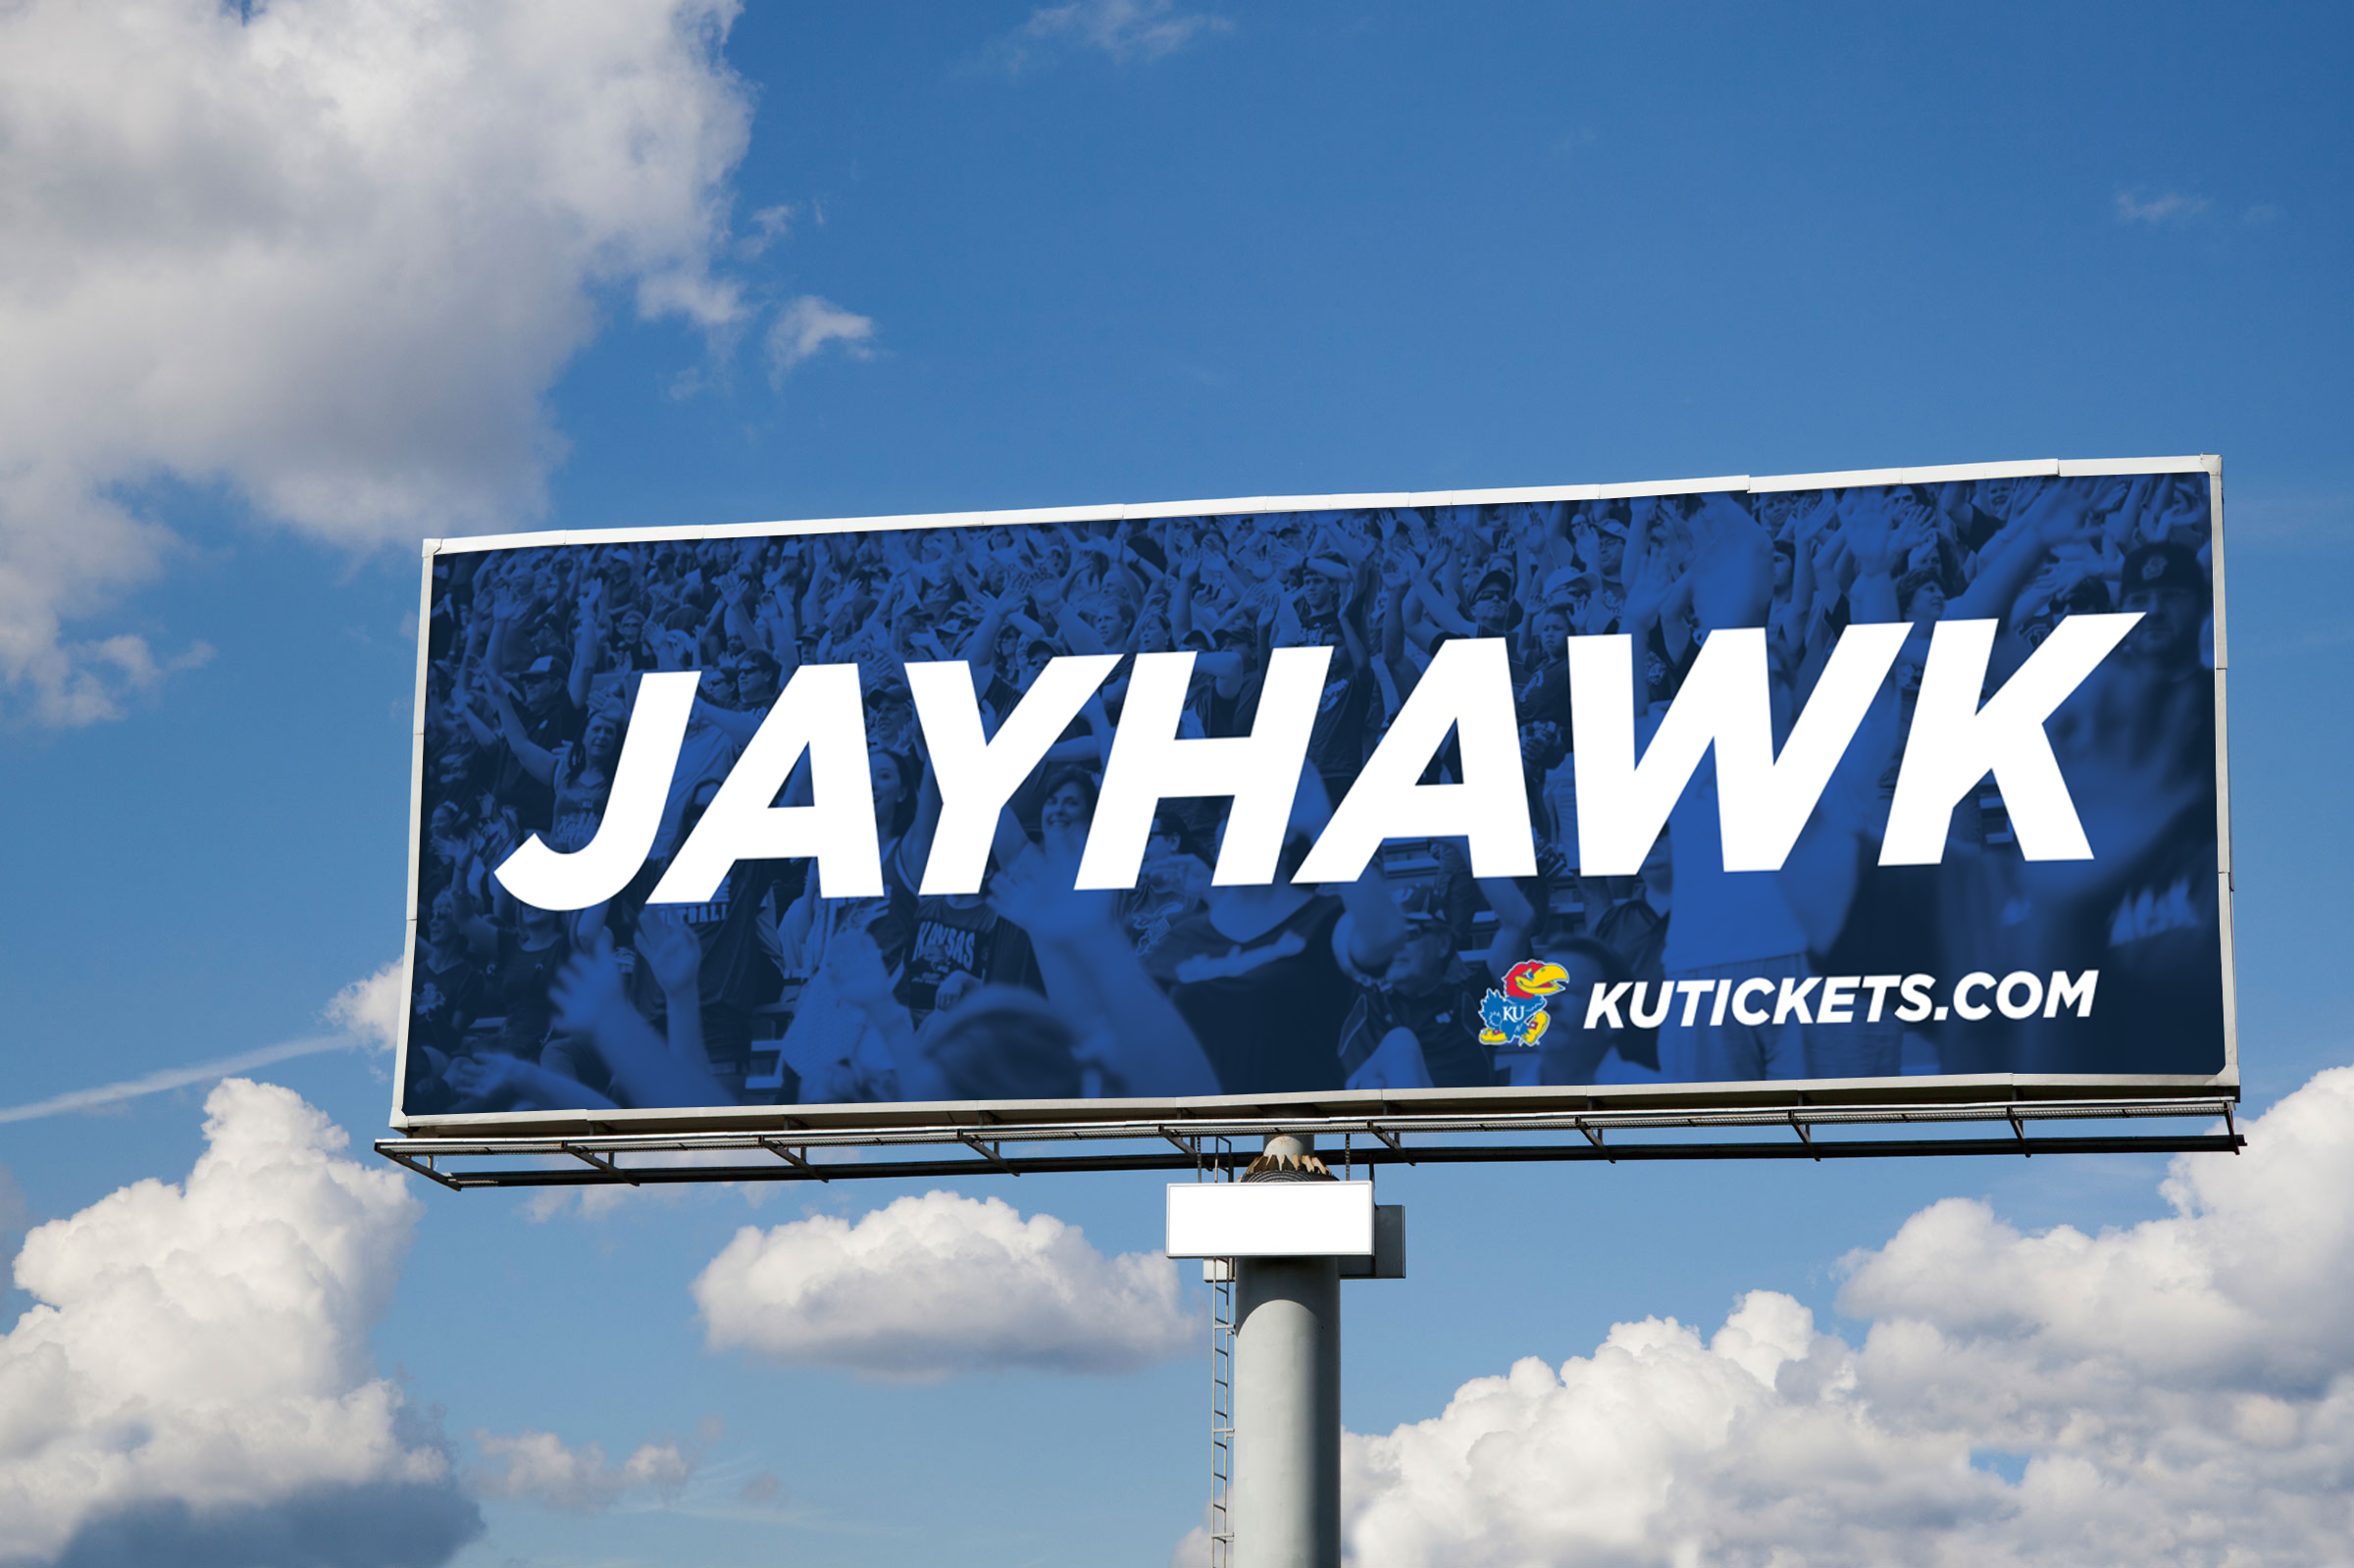 jayhawk mockup.png